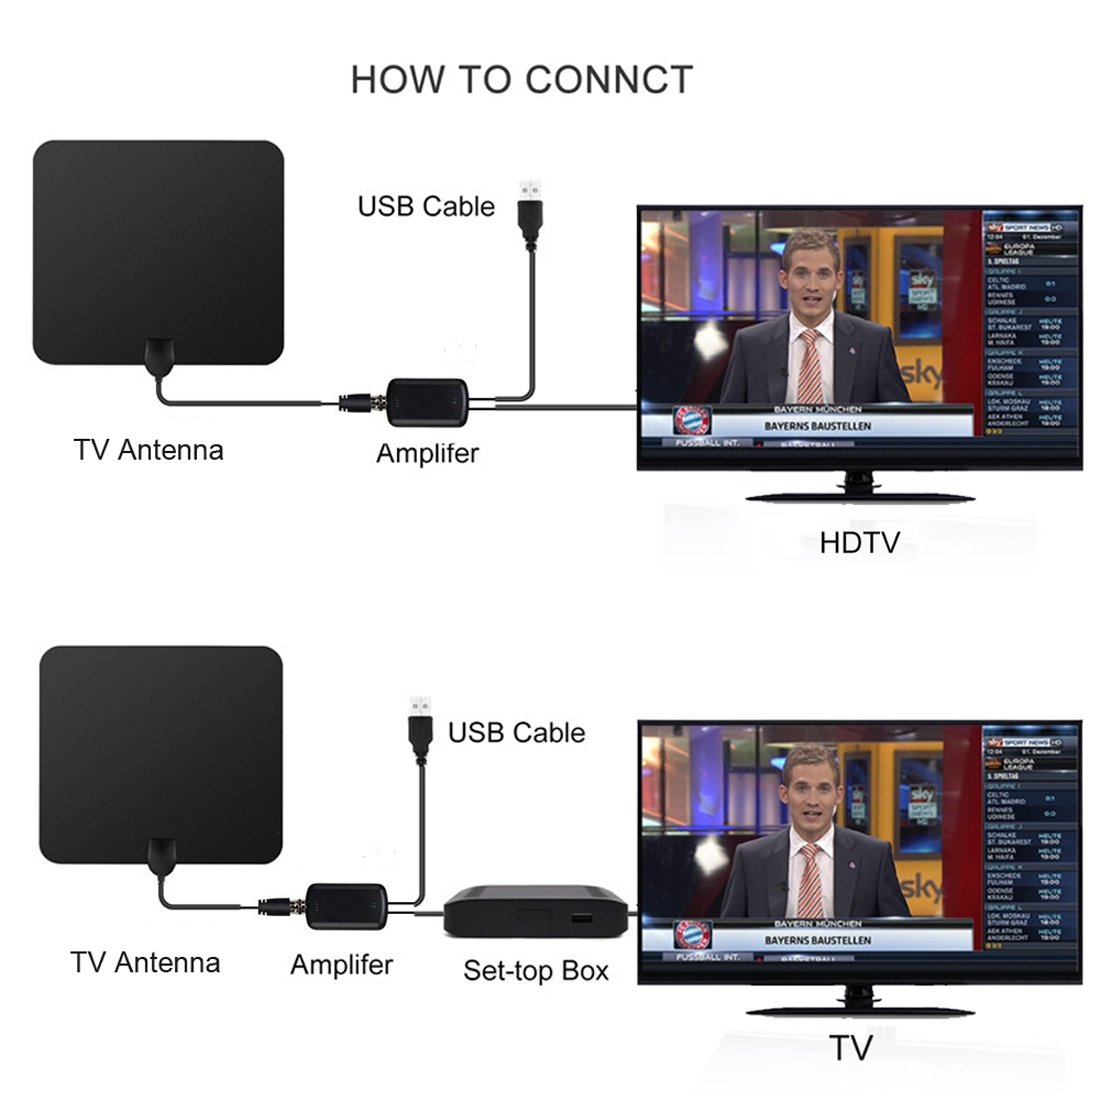 Antena TV Interior Negro Digital HDTV Antena Portatil para DVB-T TDT versi/ón 2018 Antena Interior TDT 60 Millas con Amplificador de Se/ñal y Cable Coaxial DE 13.2 FT